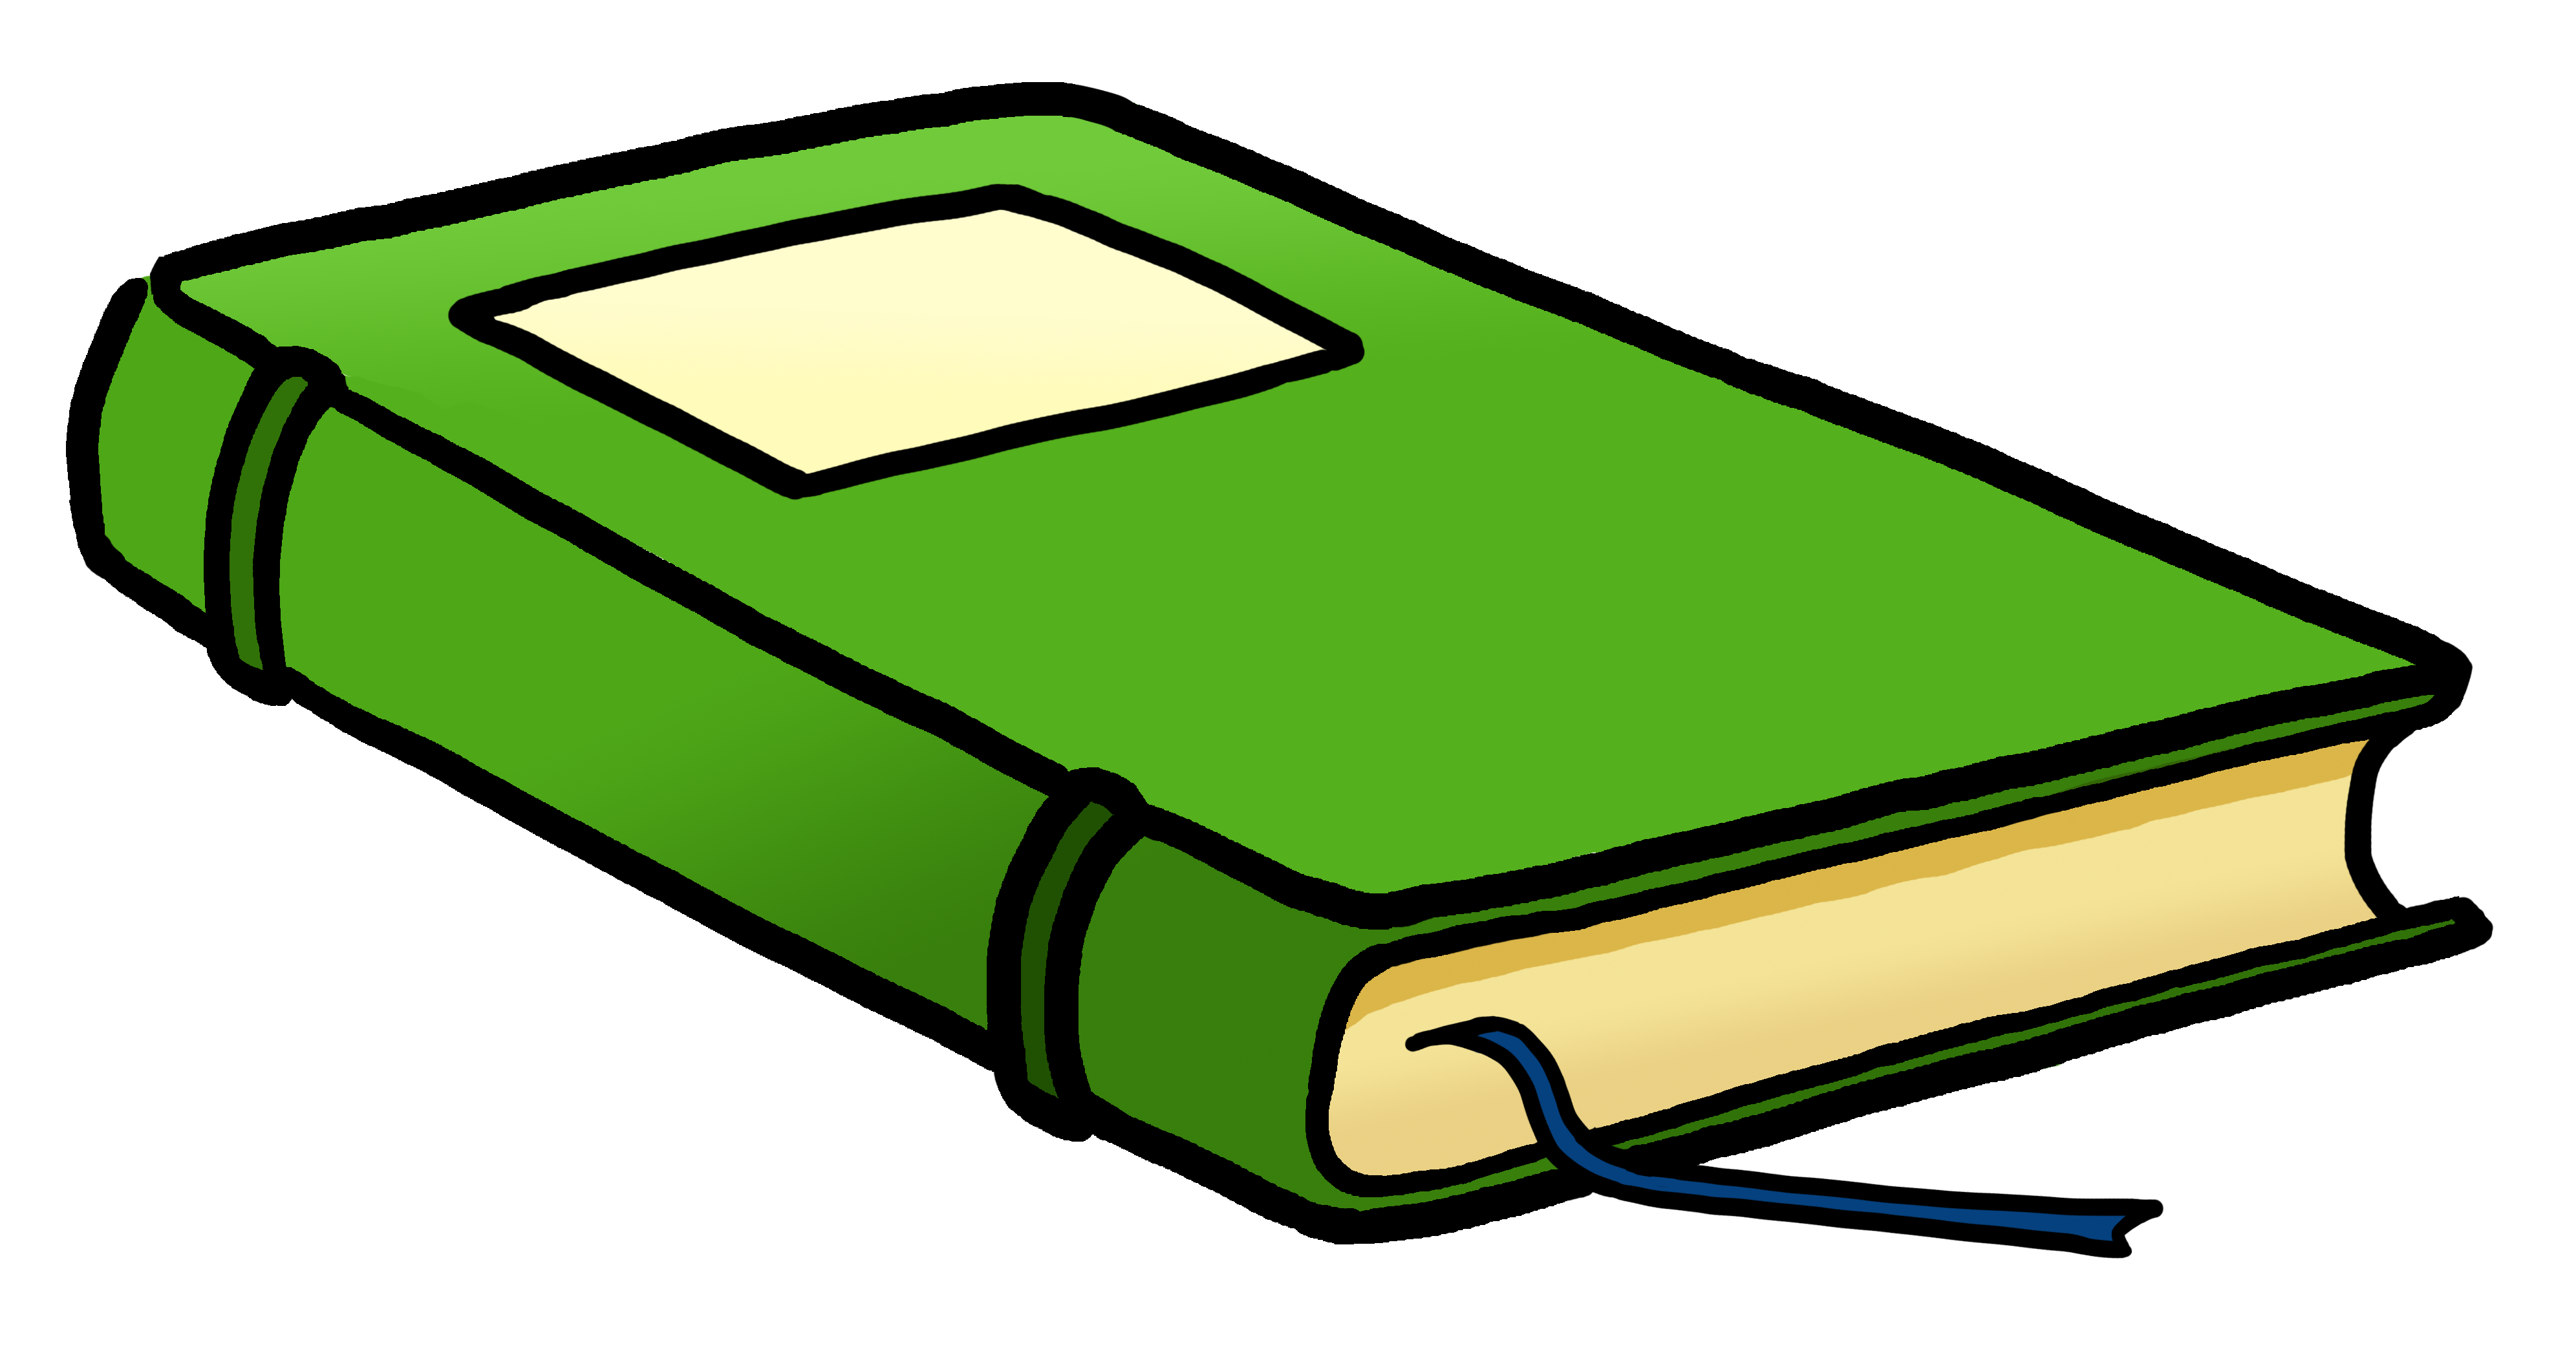 Open kids book clipart banner download Plainview Avenue Elementary School: Educational Websites banner download